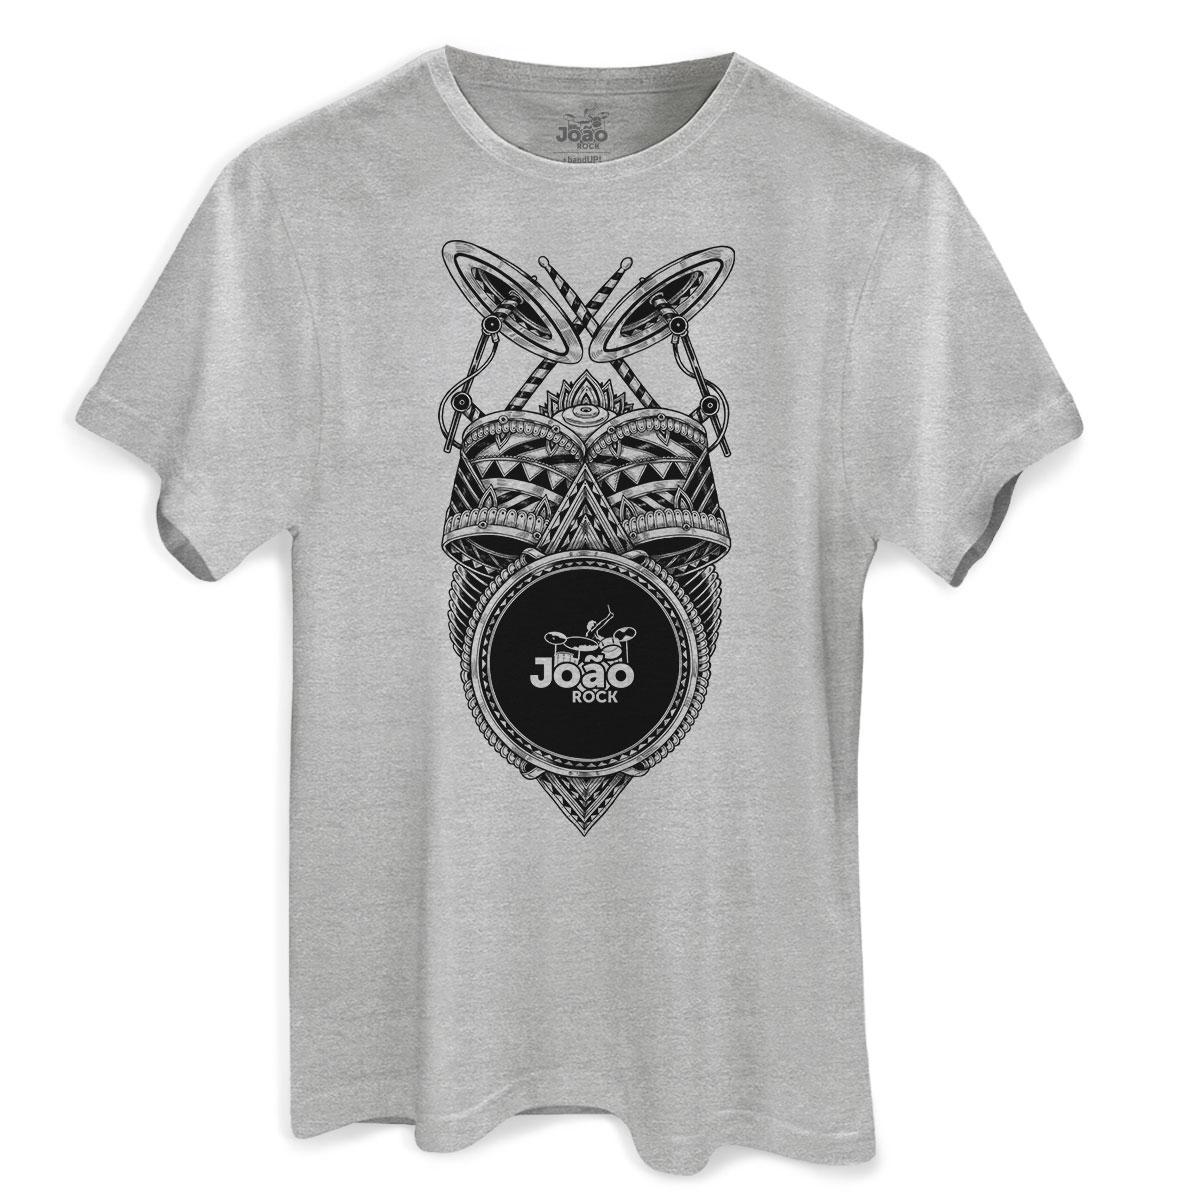 Camiseta Masculina Bateria João Rock